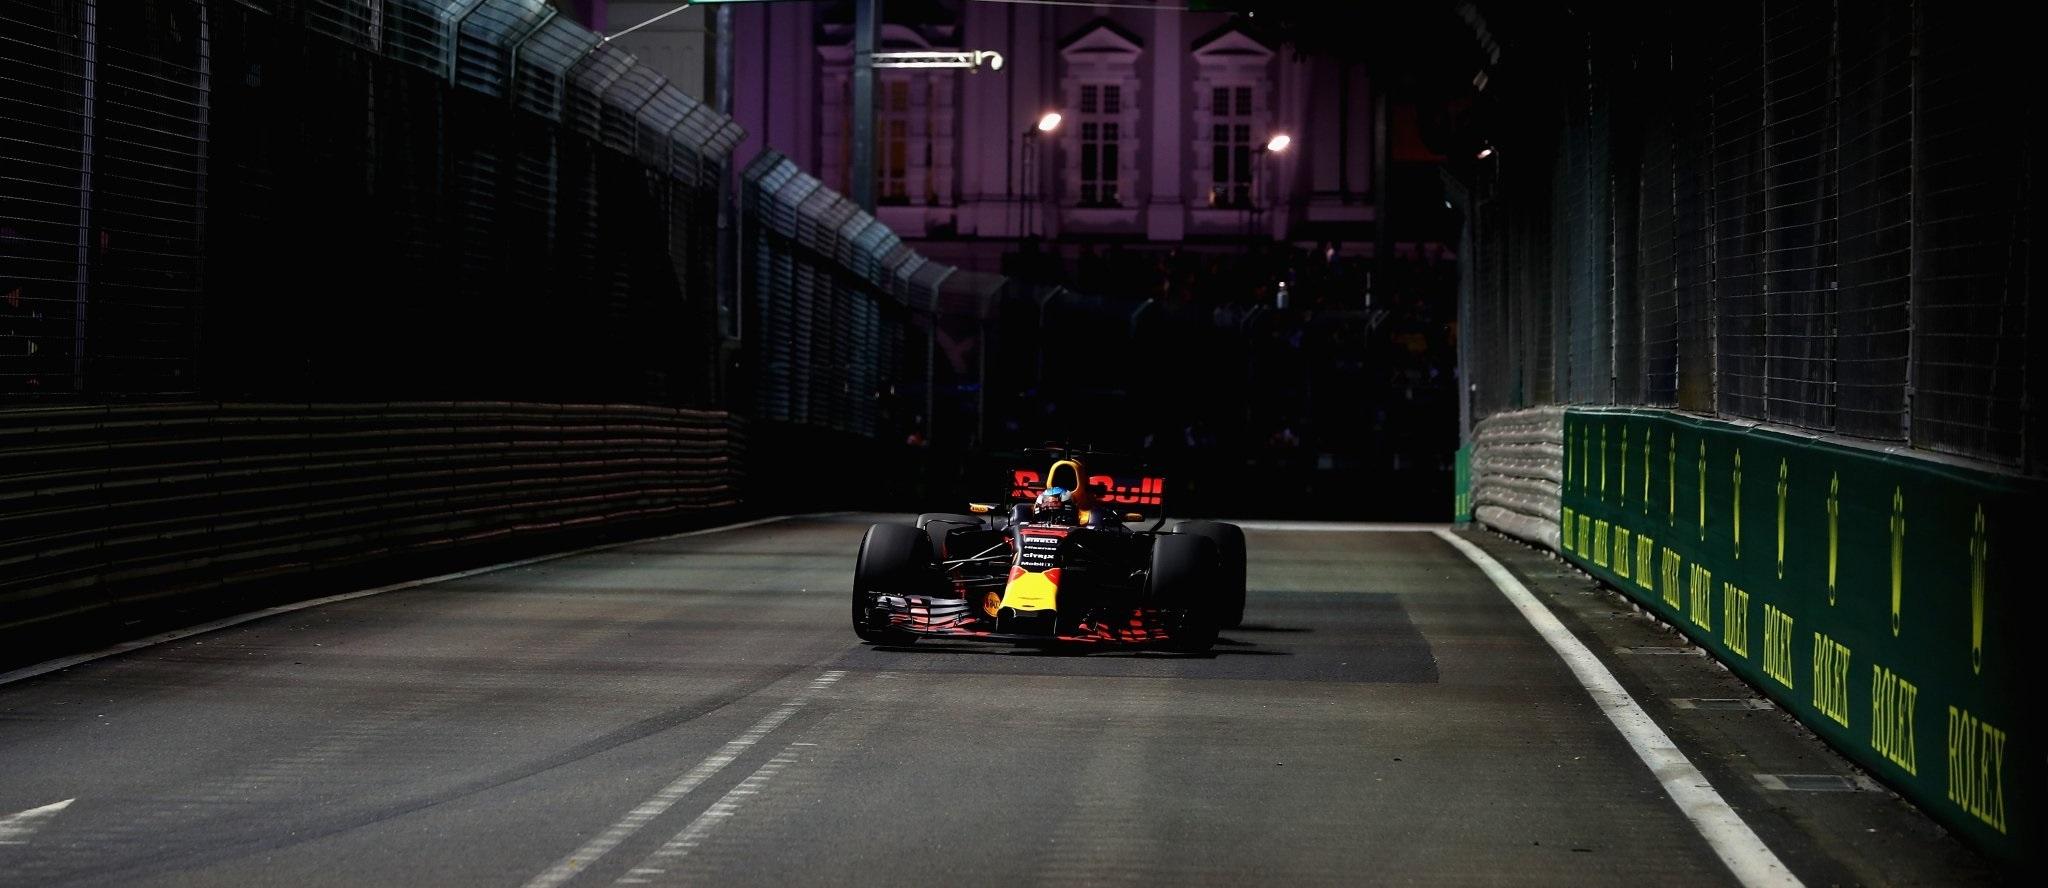 Daniel Ricciardo GP Singapur 2017 FP2